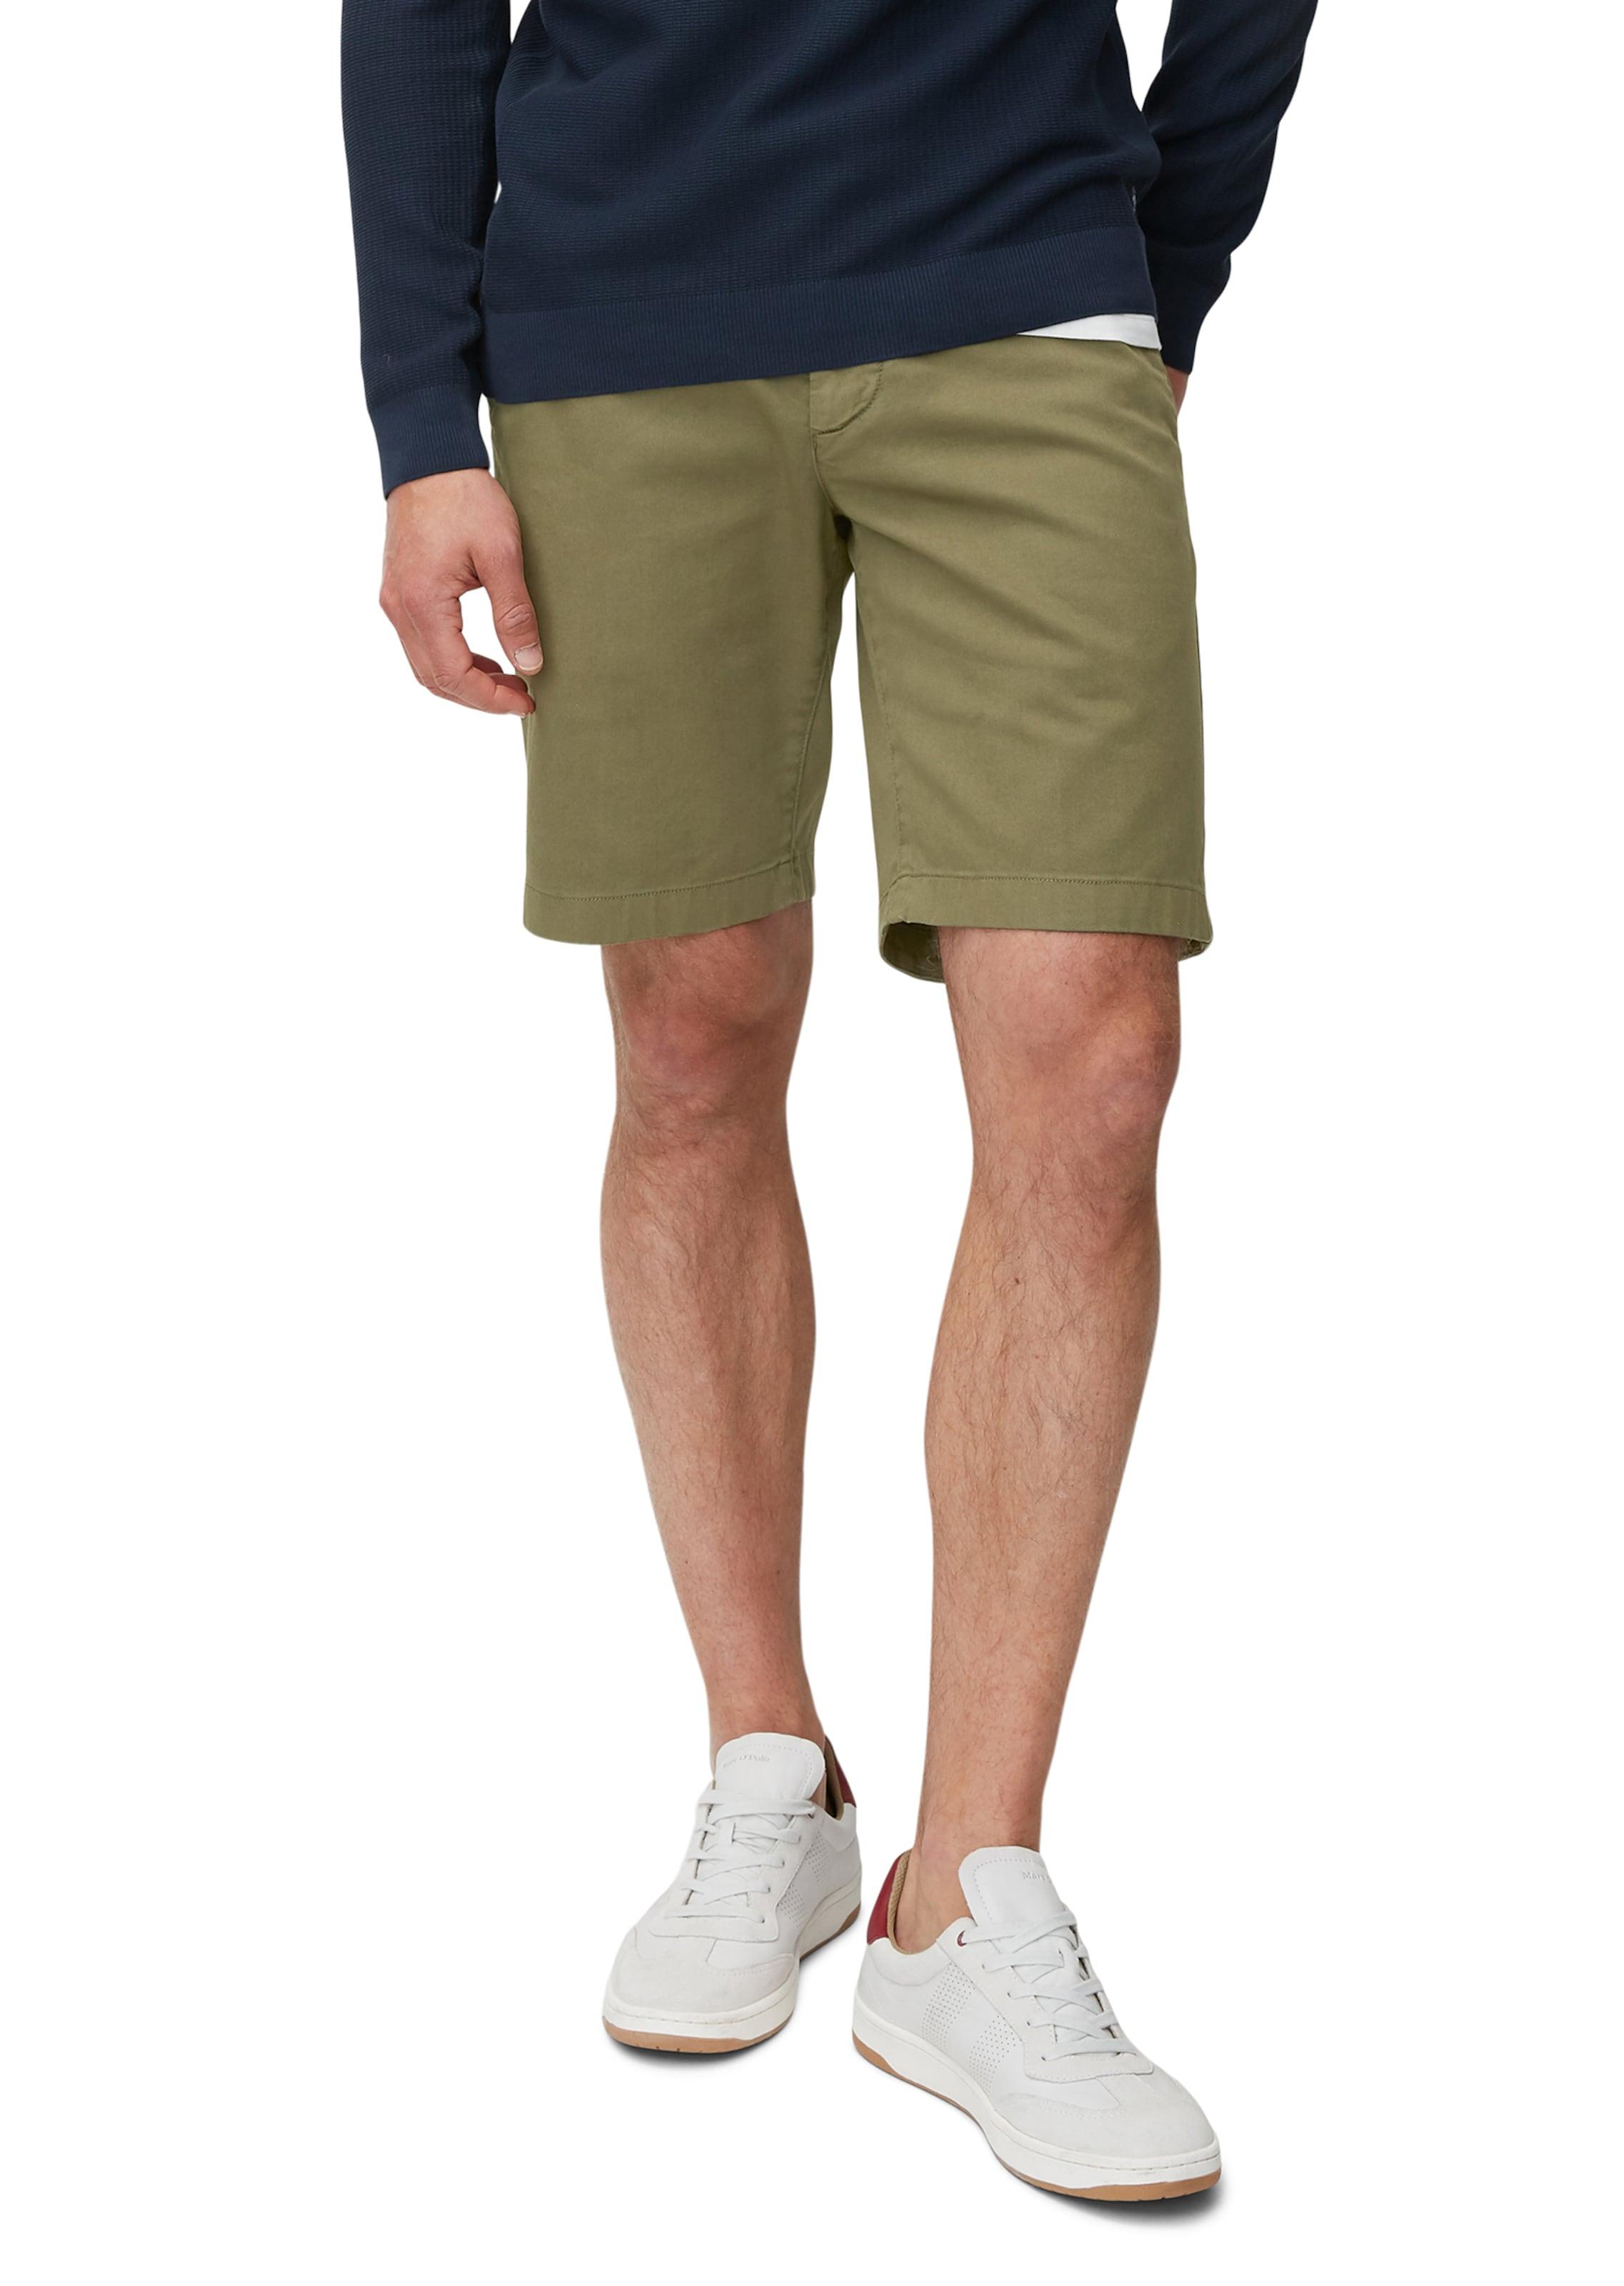 Chino Oliv O'polo Marc shorts 'salo' In iXTOkPZulw